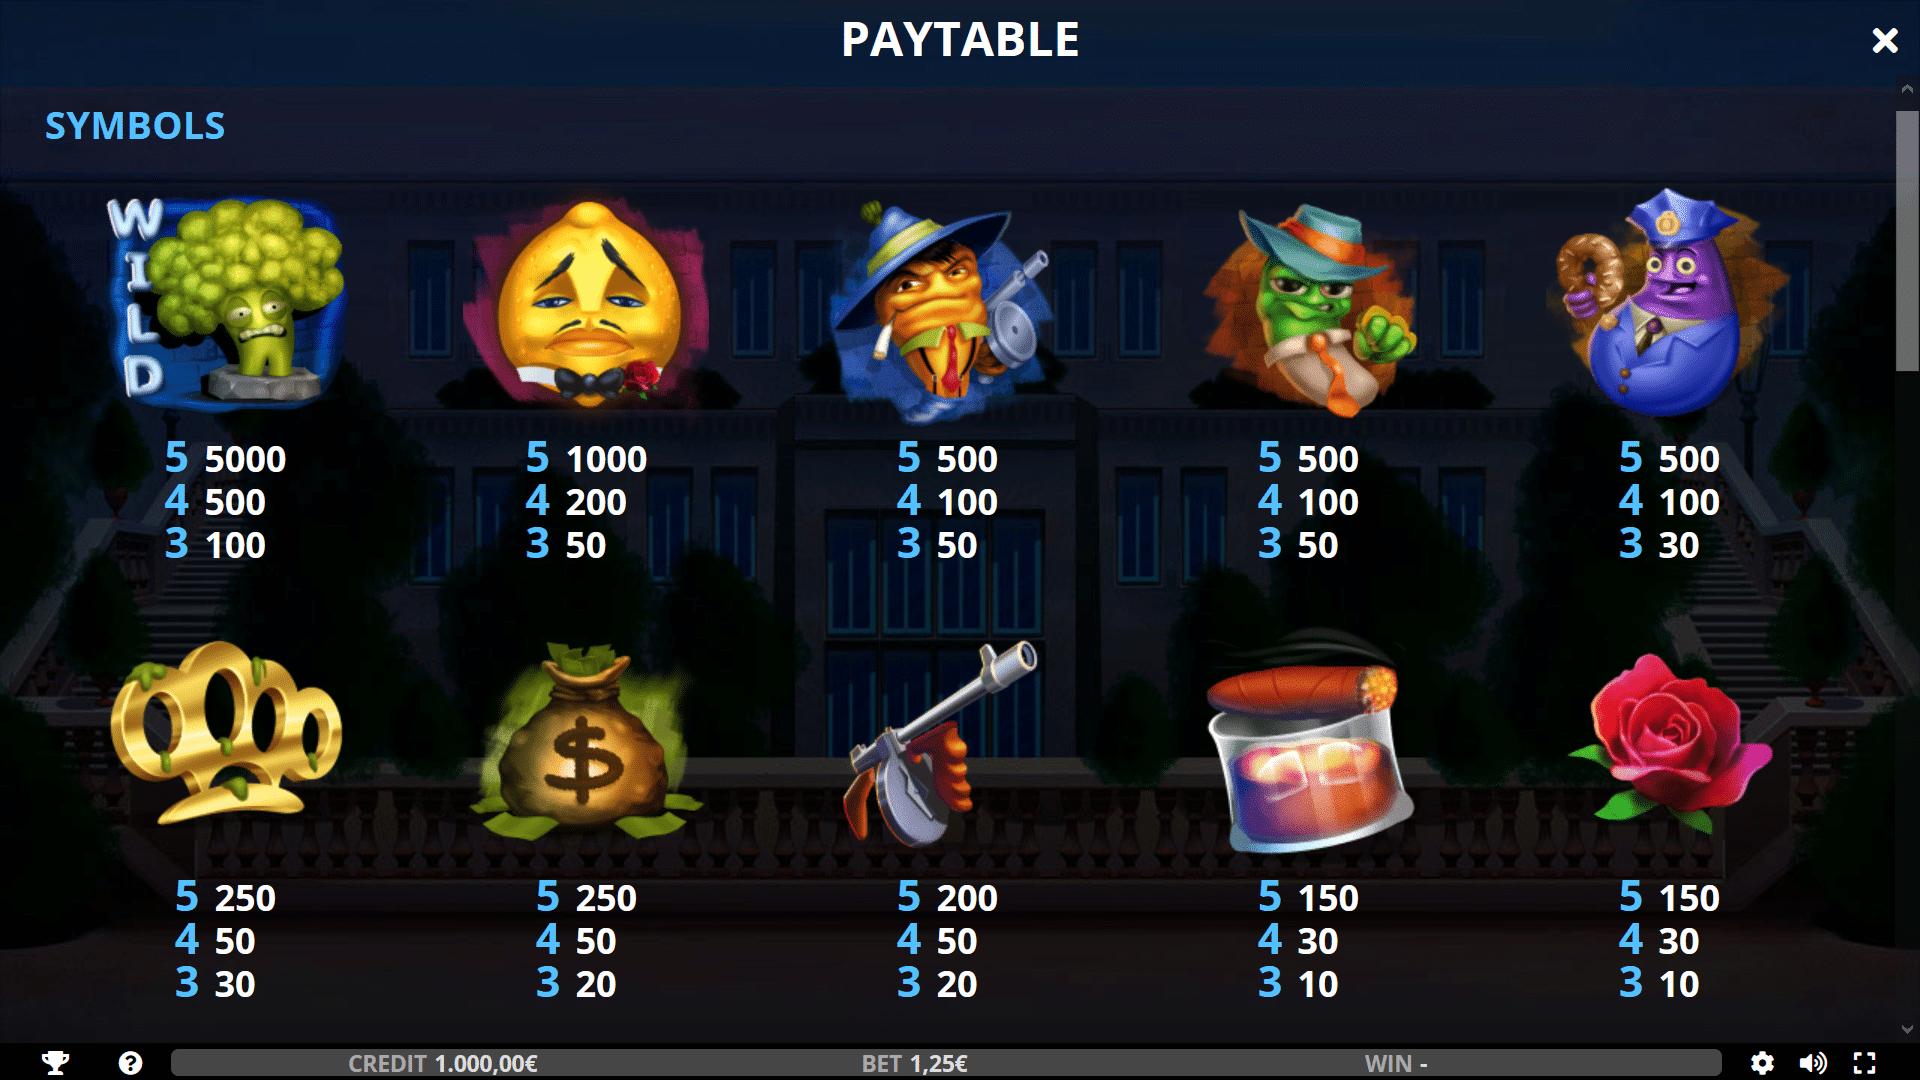 Paytable della Slot Gratis Don Corlimone